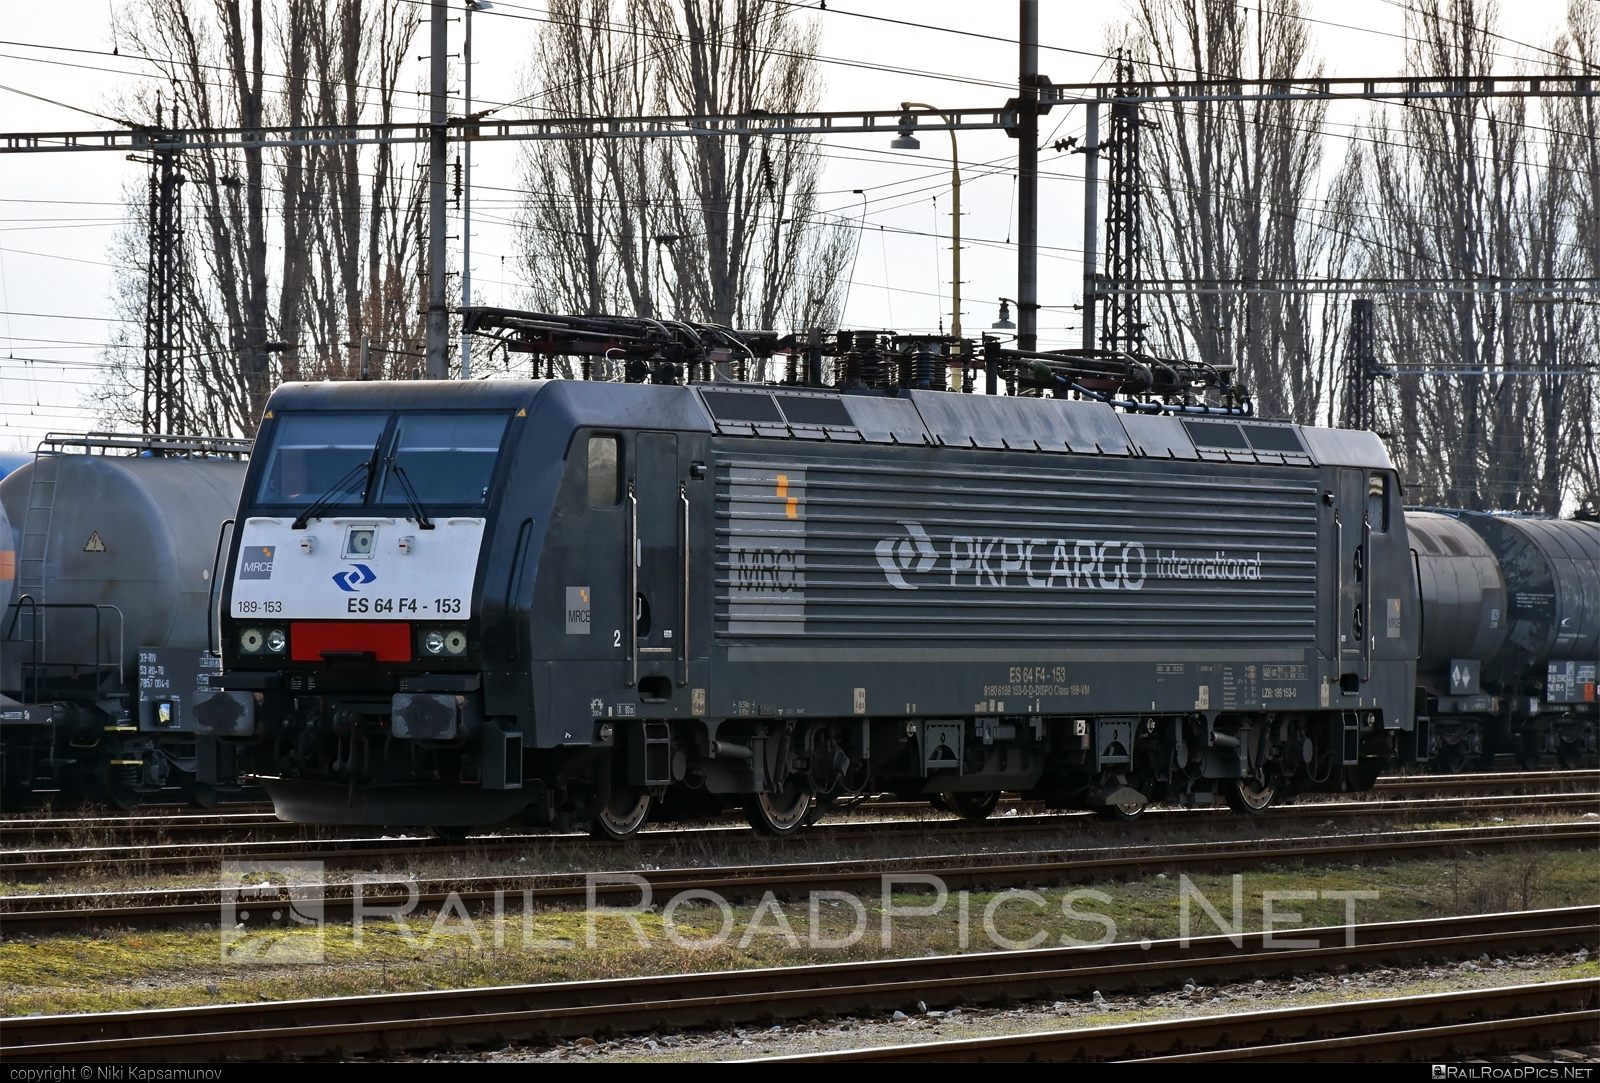 Siemens ES 64 F4 - 189 153-0 operated by PKP CARGO INTERNATIONAL a.s. #dispolok #es64 #es64f4 #eurosprinter #mitsuirailcapitaleurope #mitsuirailcapitaleuropegmbh #mrce #pkpcargo #pkpcargointernational #pkpcargointernationalas #siemens #siemenses64 #siemenses64f4